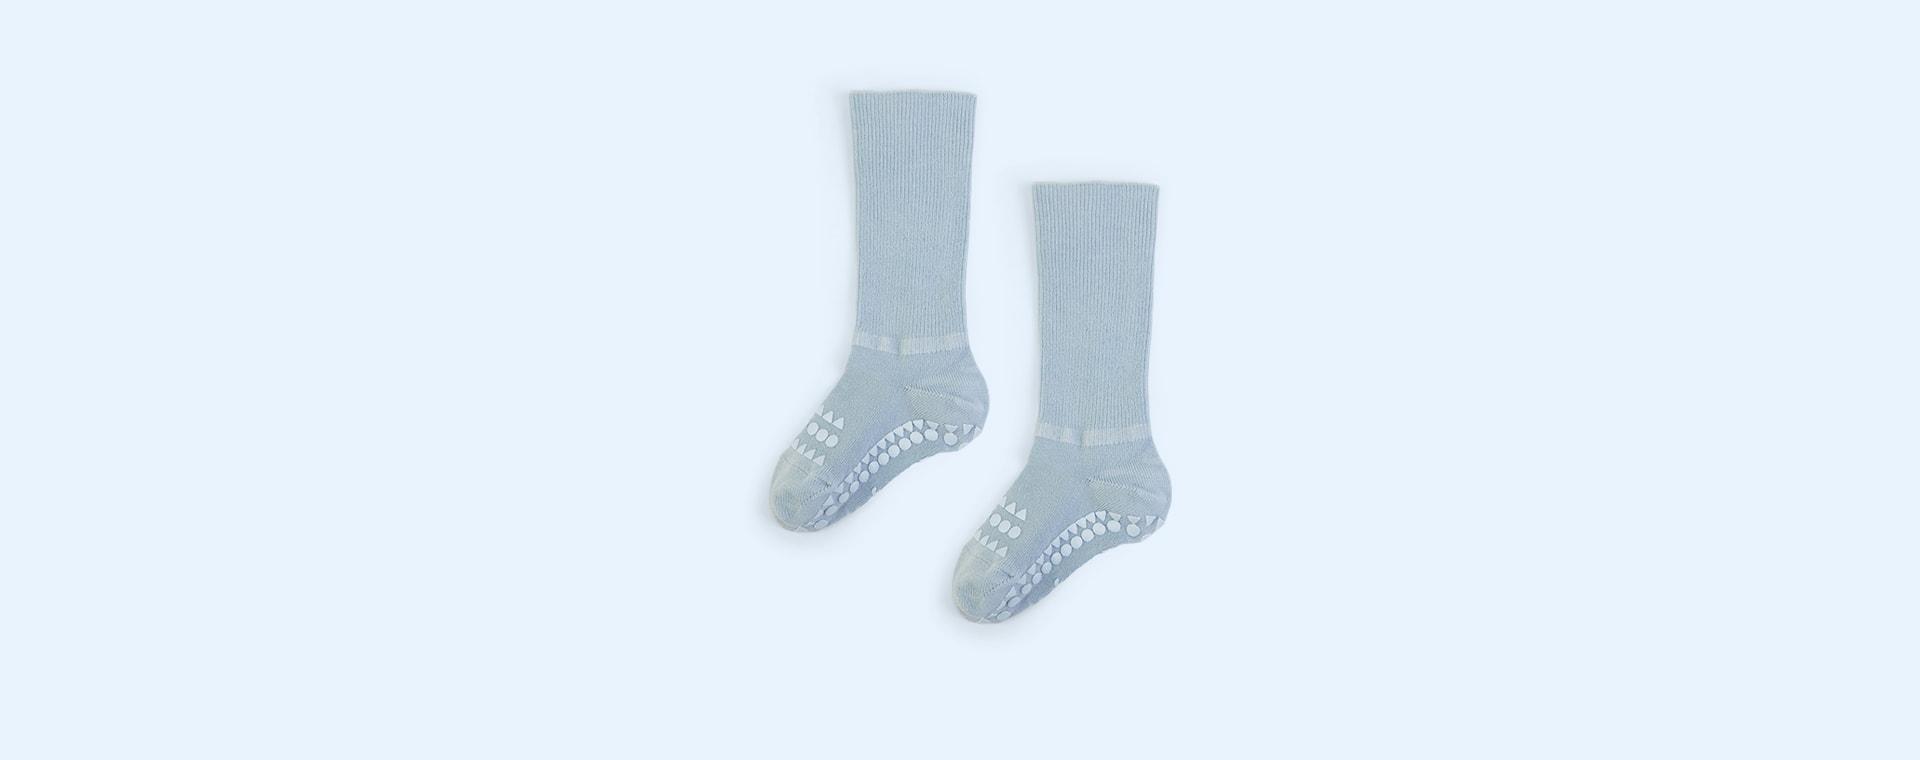 Sky Blue GoBabyGo Bamboo Socks